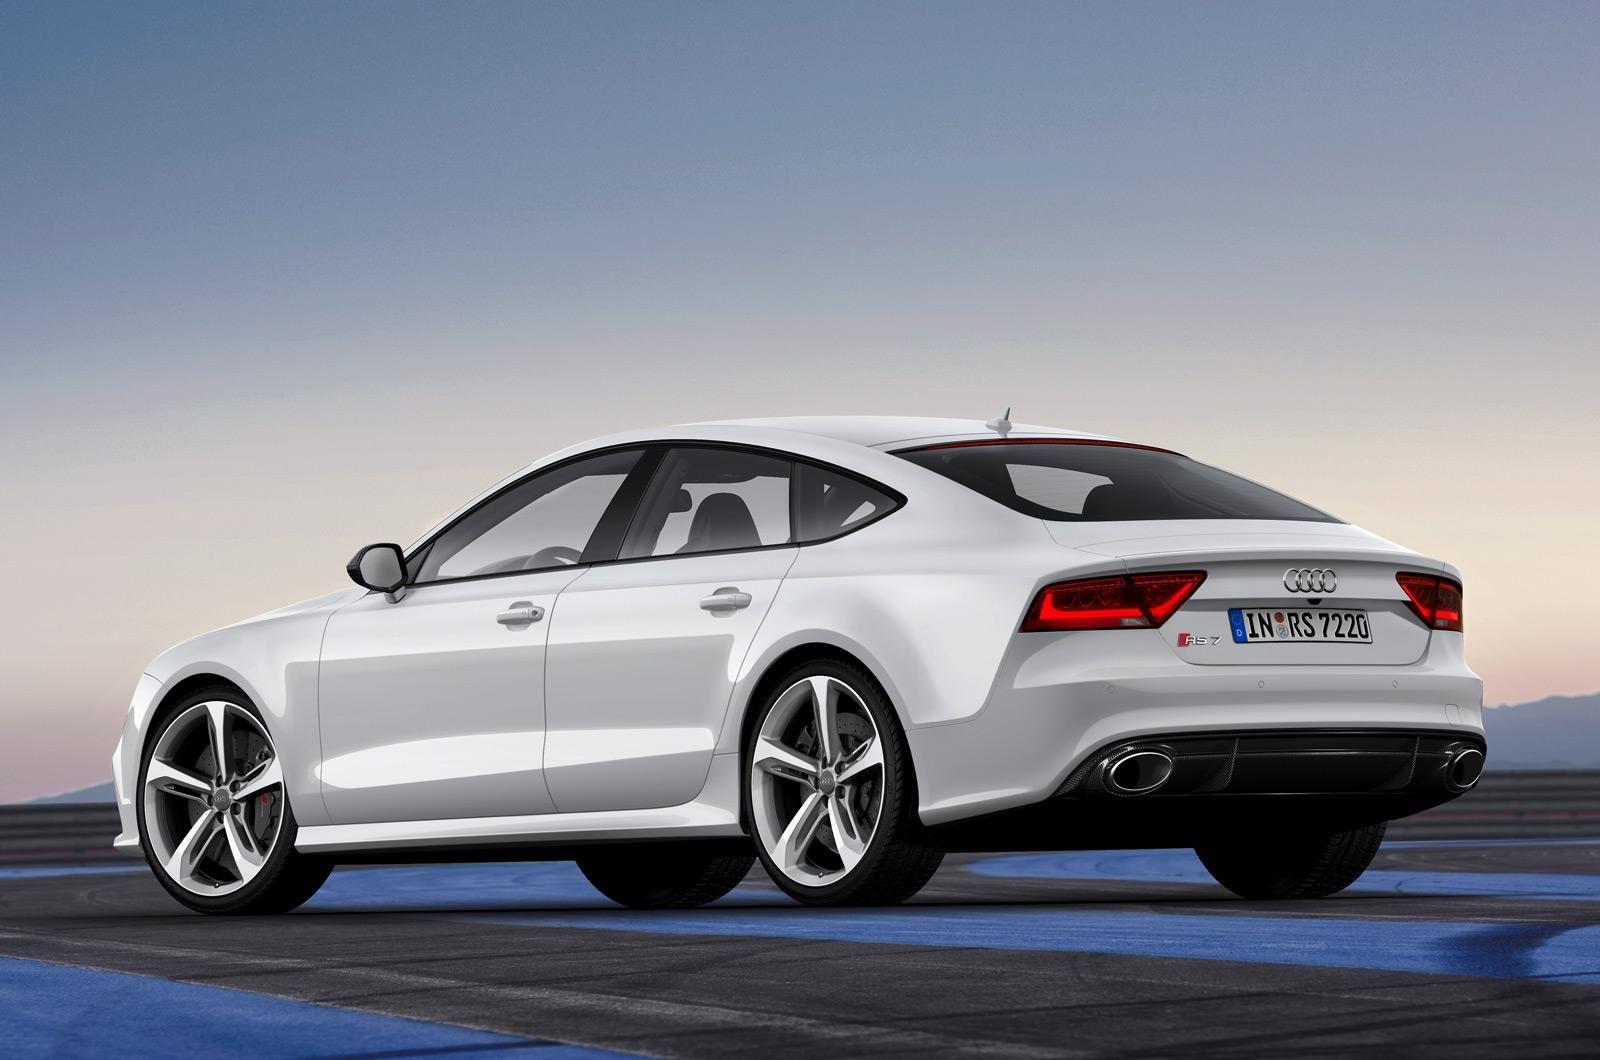 Audi Leave A Reply Cancel Reply Audi Pinterest Audi Audi - Audi audi